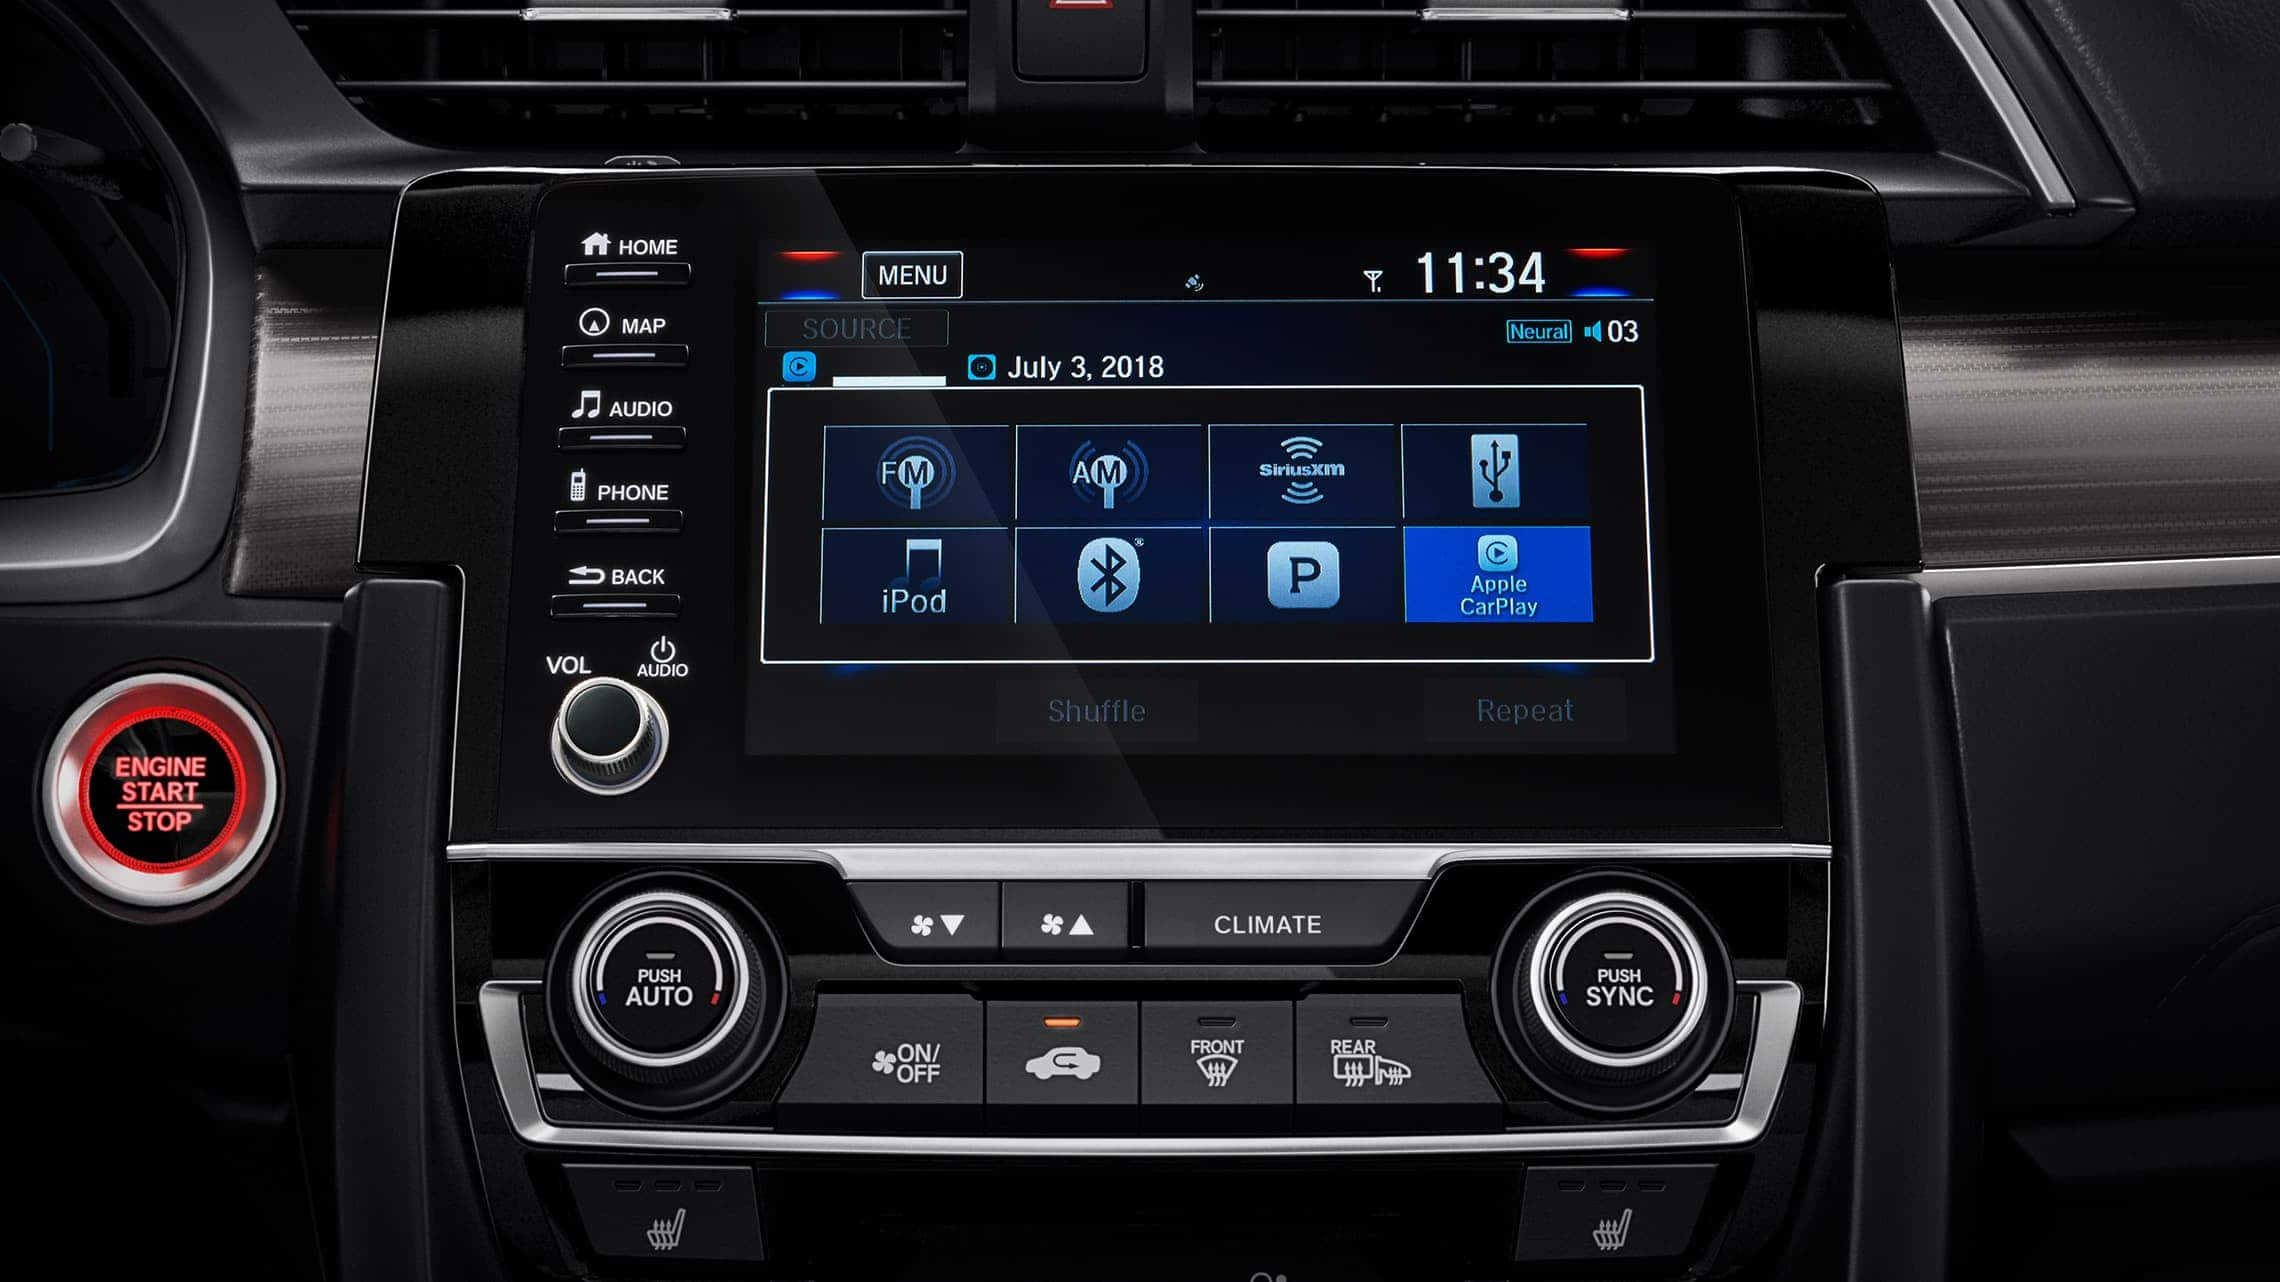 Detalle del sistema de audio en pantalla táctil del Honda Civic Touring Sedán2020.